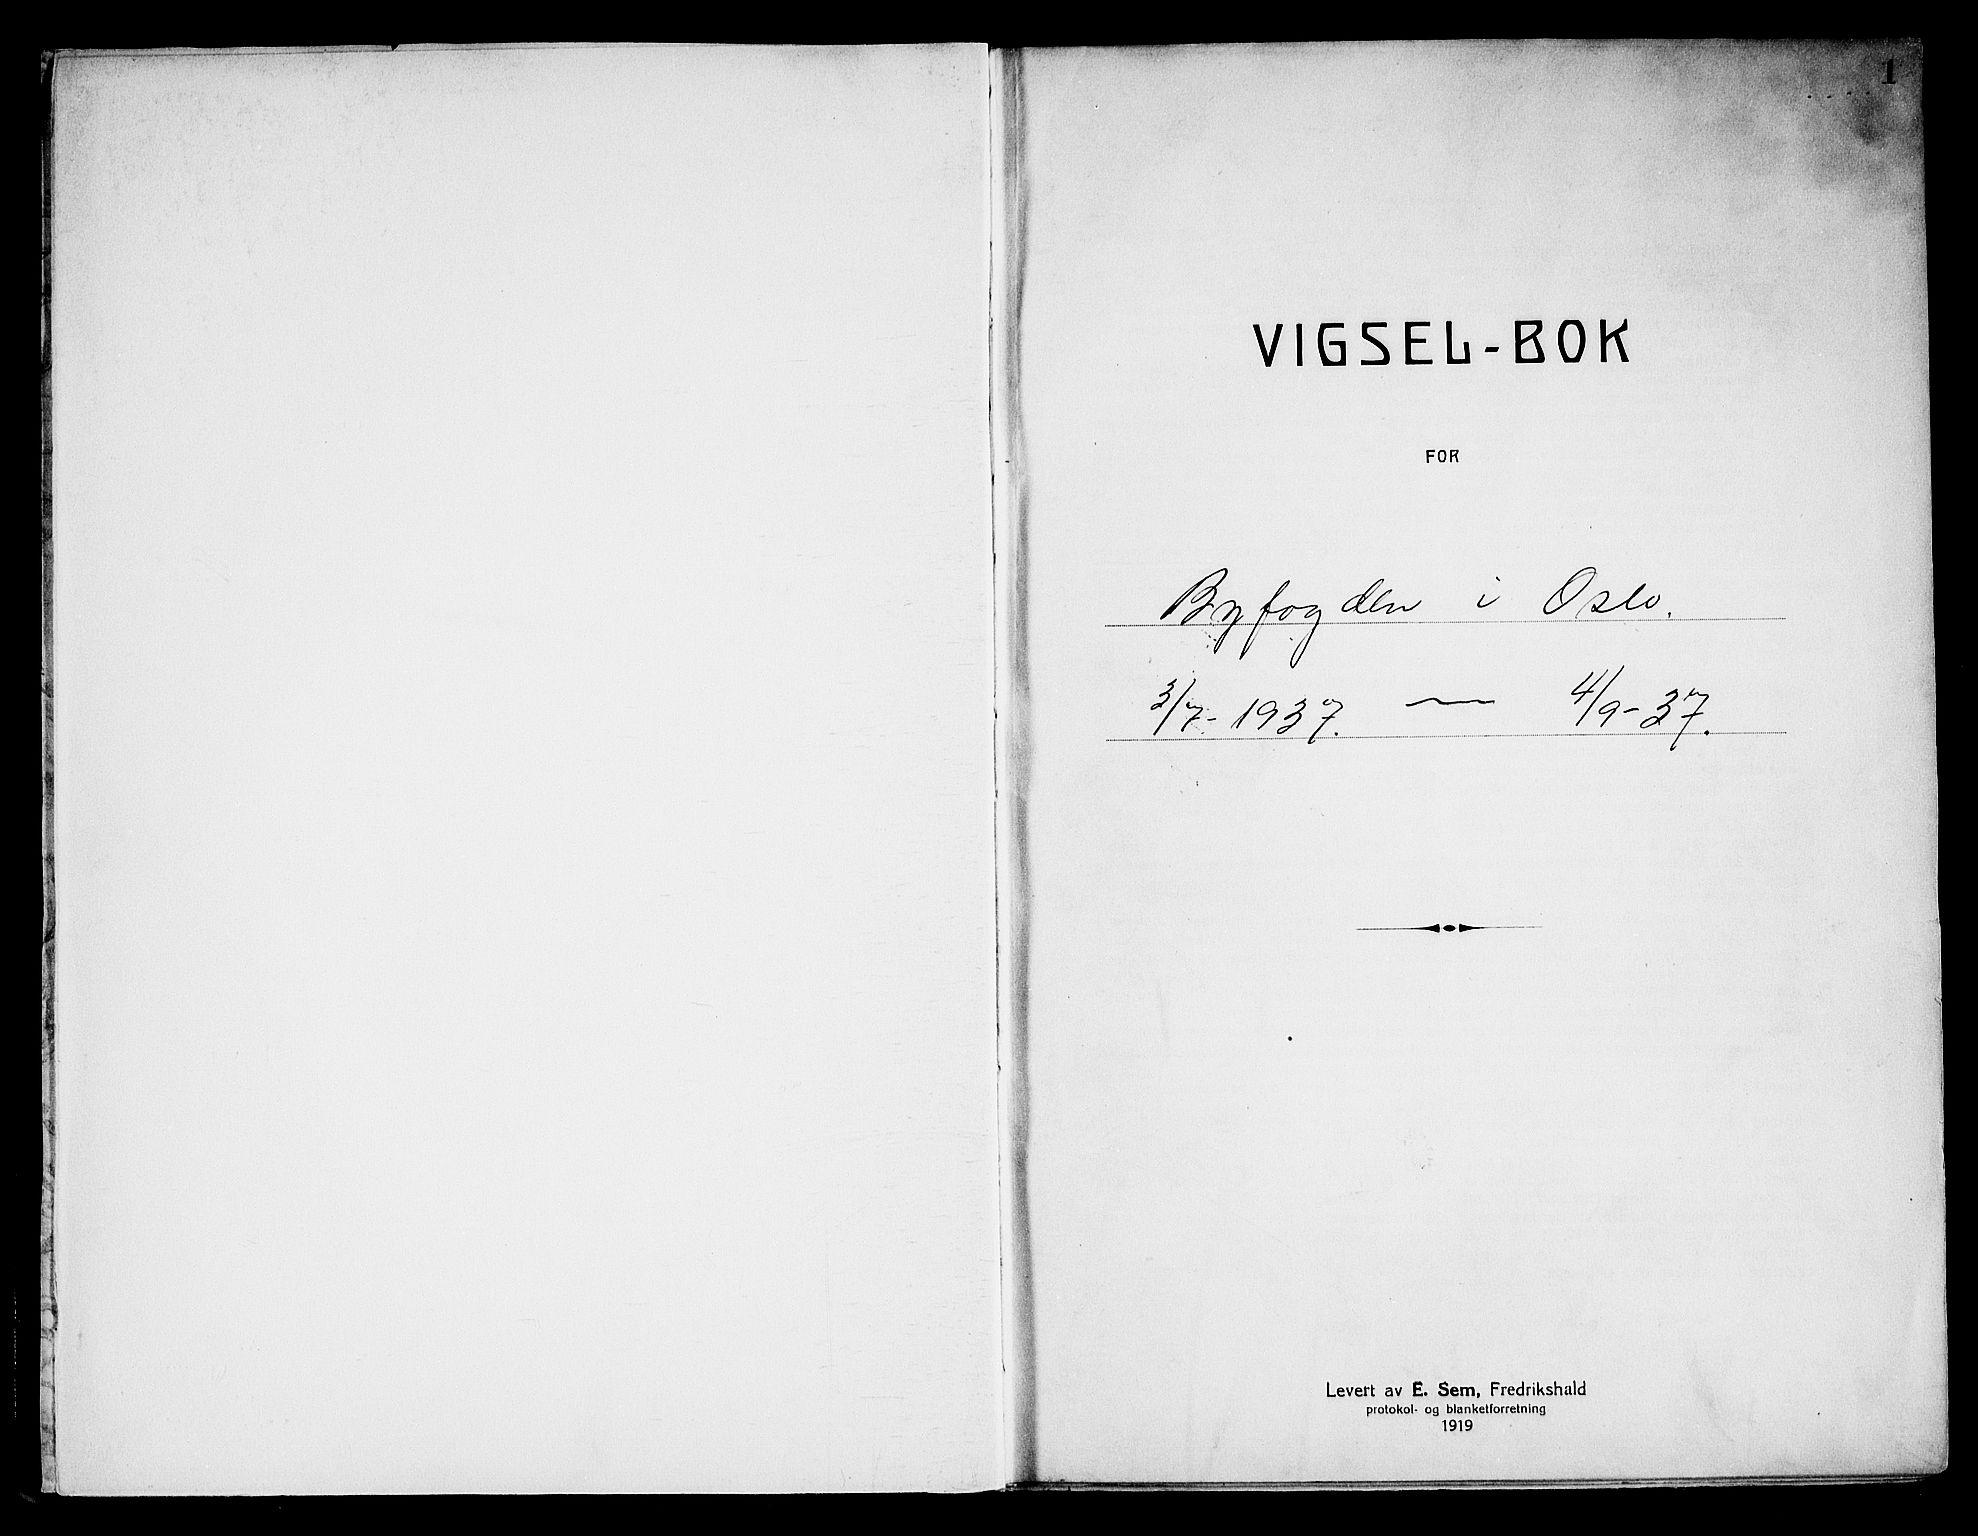 SAO, Oslo byfogd avd. I, L/Lb/Lbb/L0028: Notarialprotokoll, rekke II: Vigsler, 1937, s. 1a